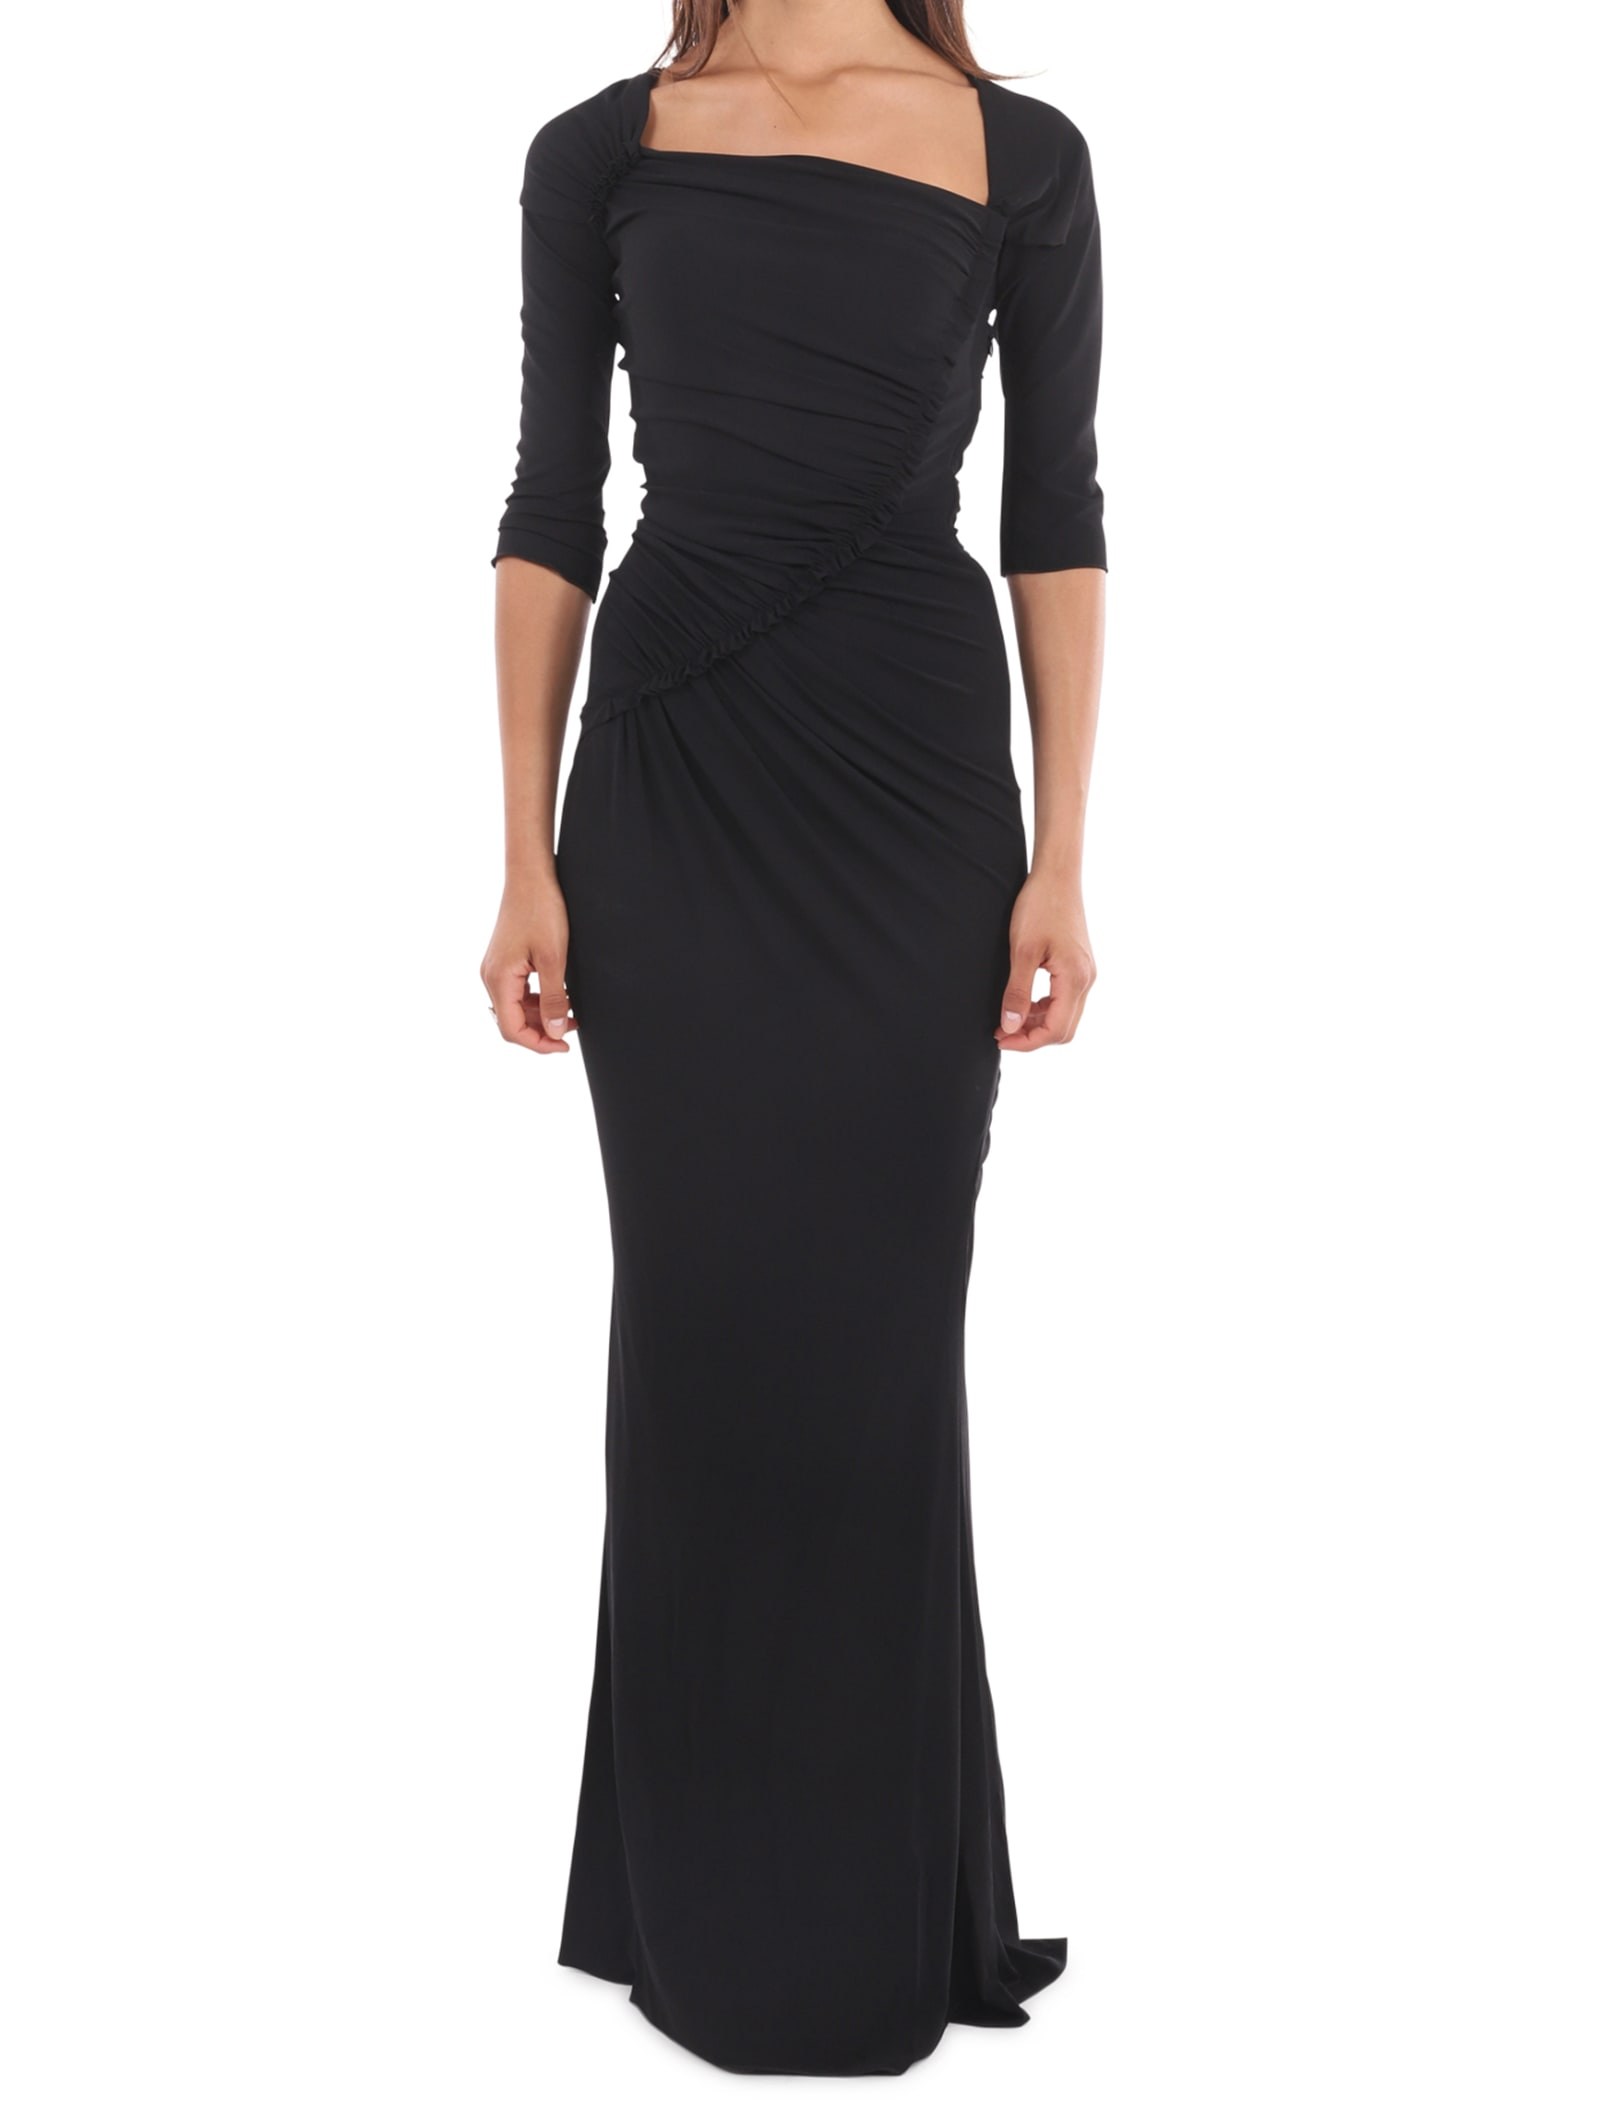 Dolce & Gabbana Long Black Dress